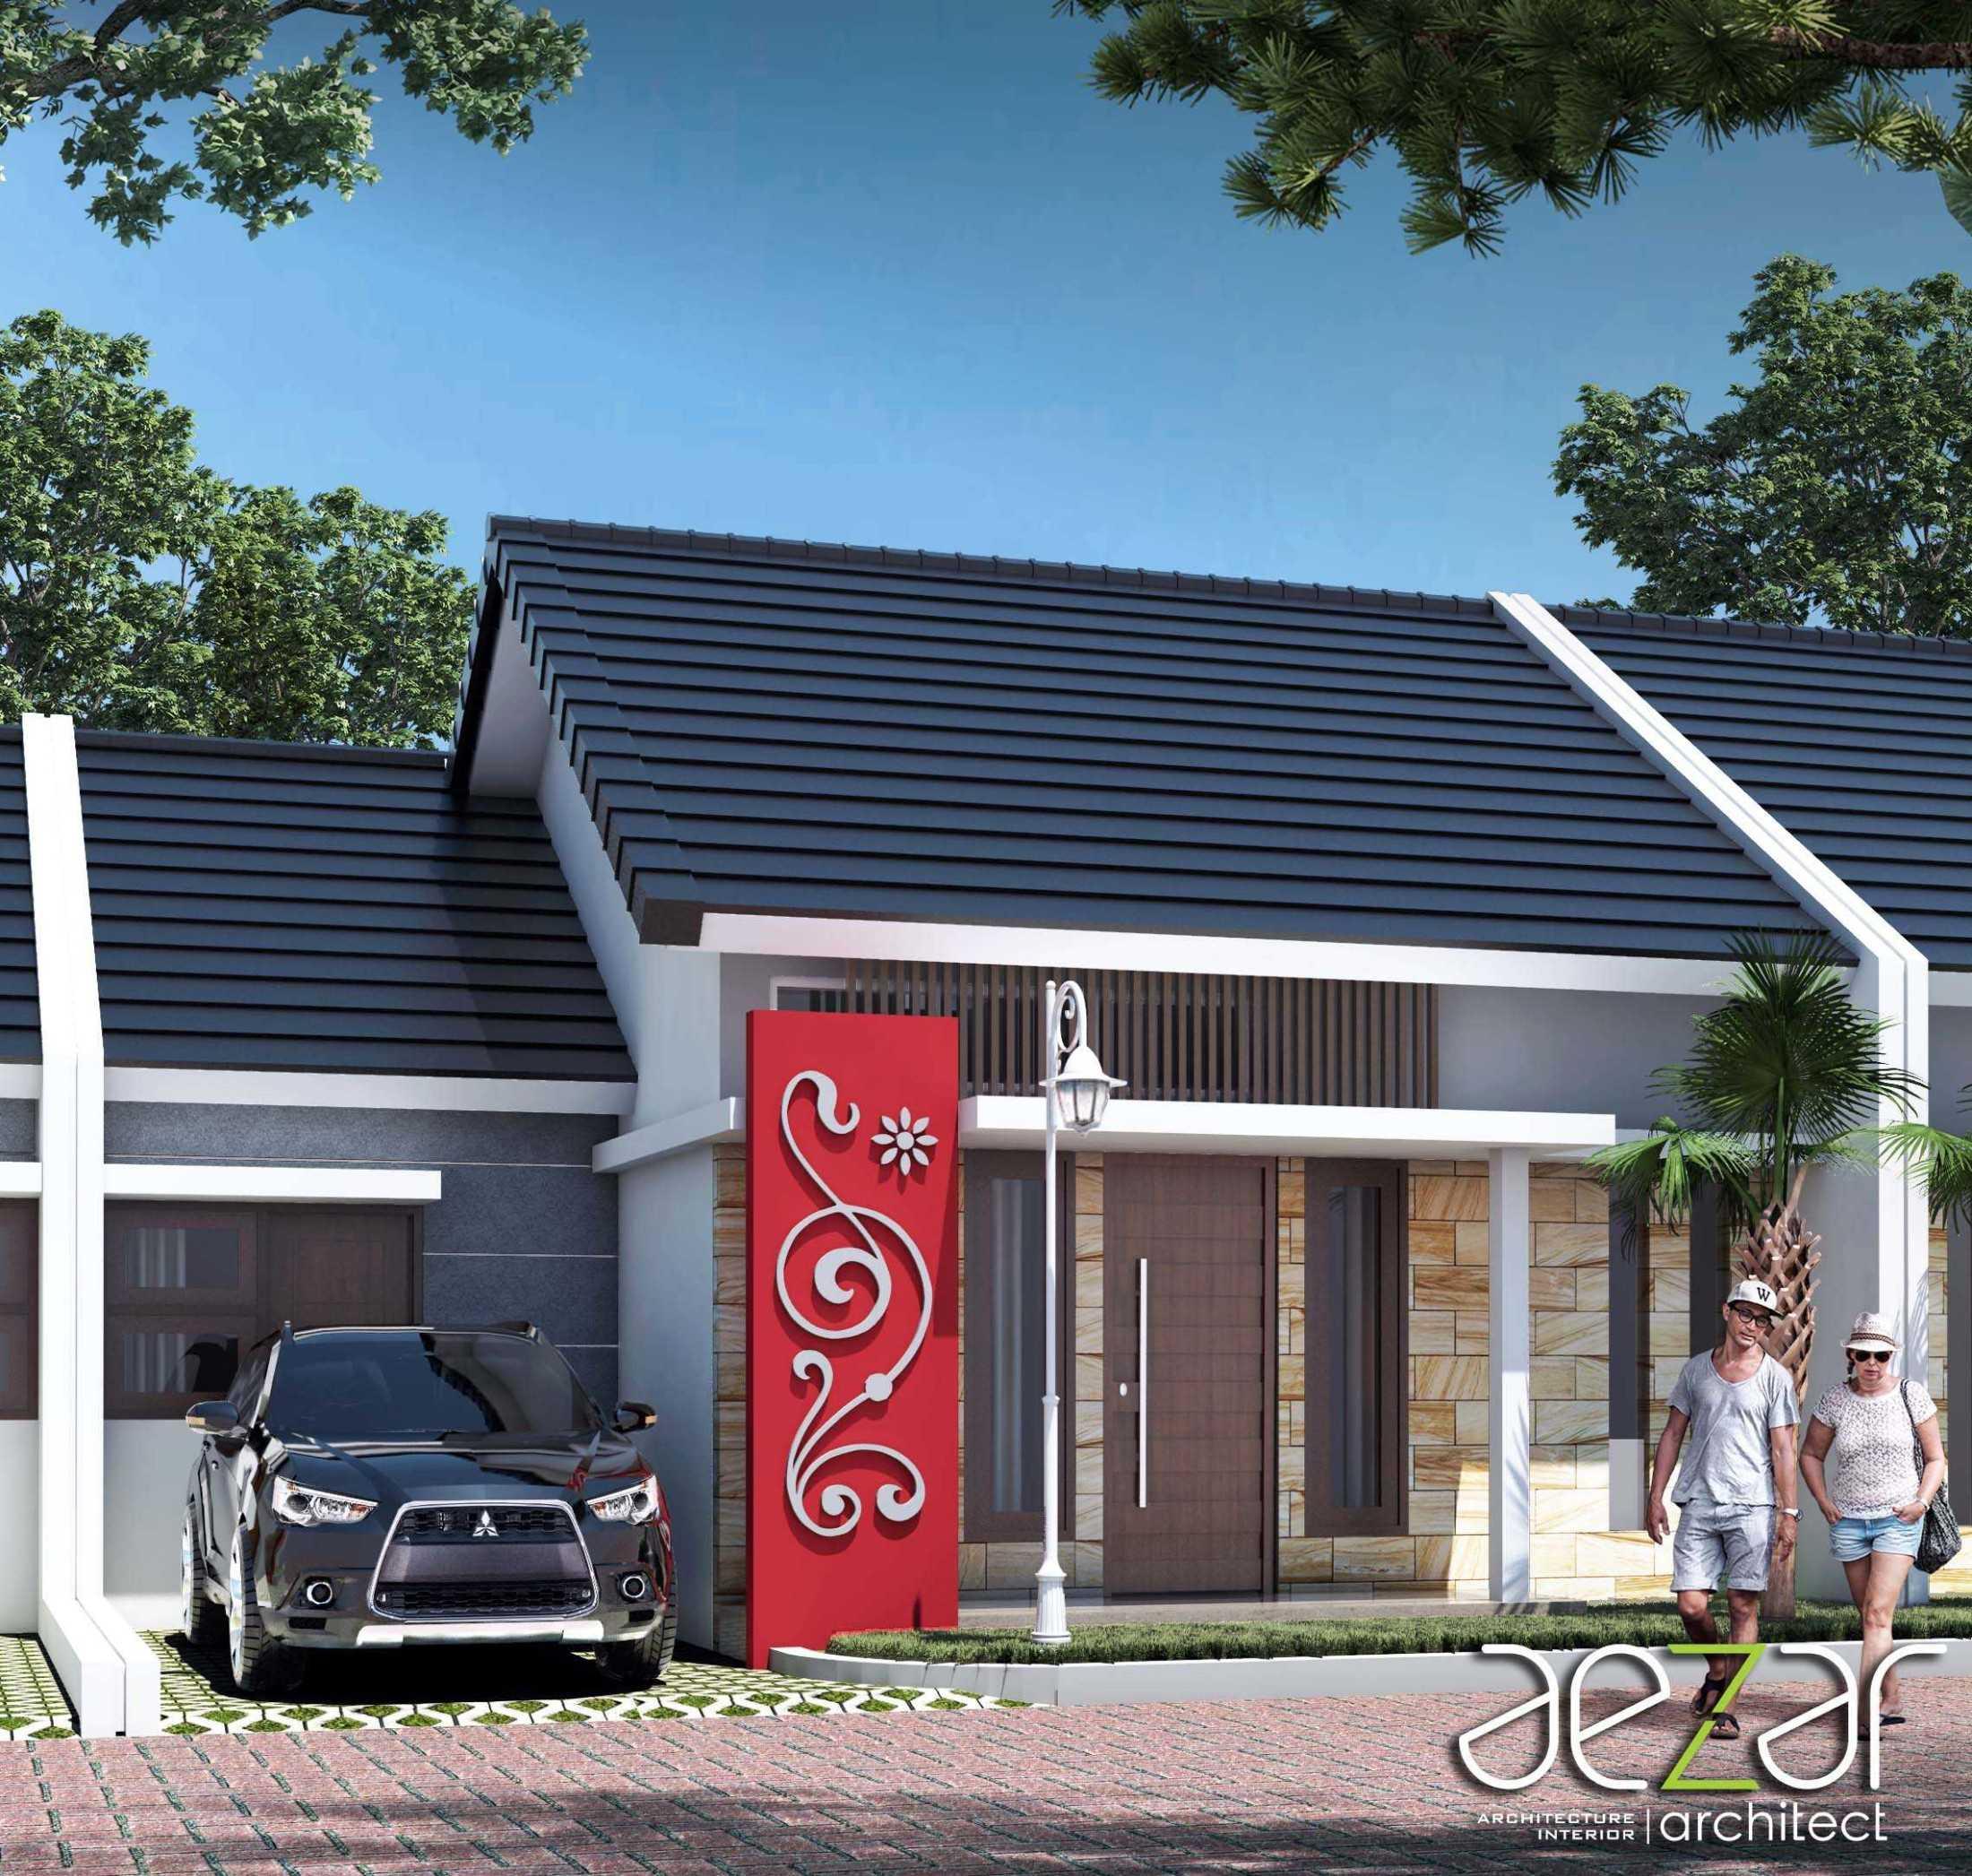 Aezar Architect Perumahan Villa Exist Sempurna Kabupaten Batang, Jawa Tengah, Indonesia Kabupaten Batang, Jawa Tengah, Indonesia Exterior View Minimalis 54486